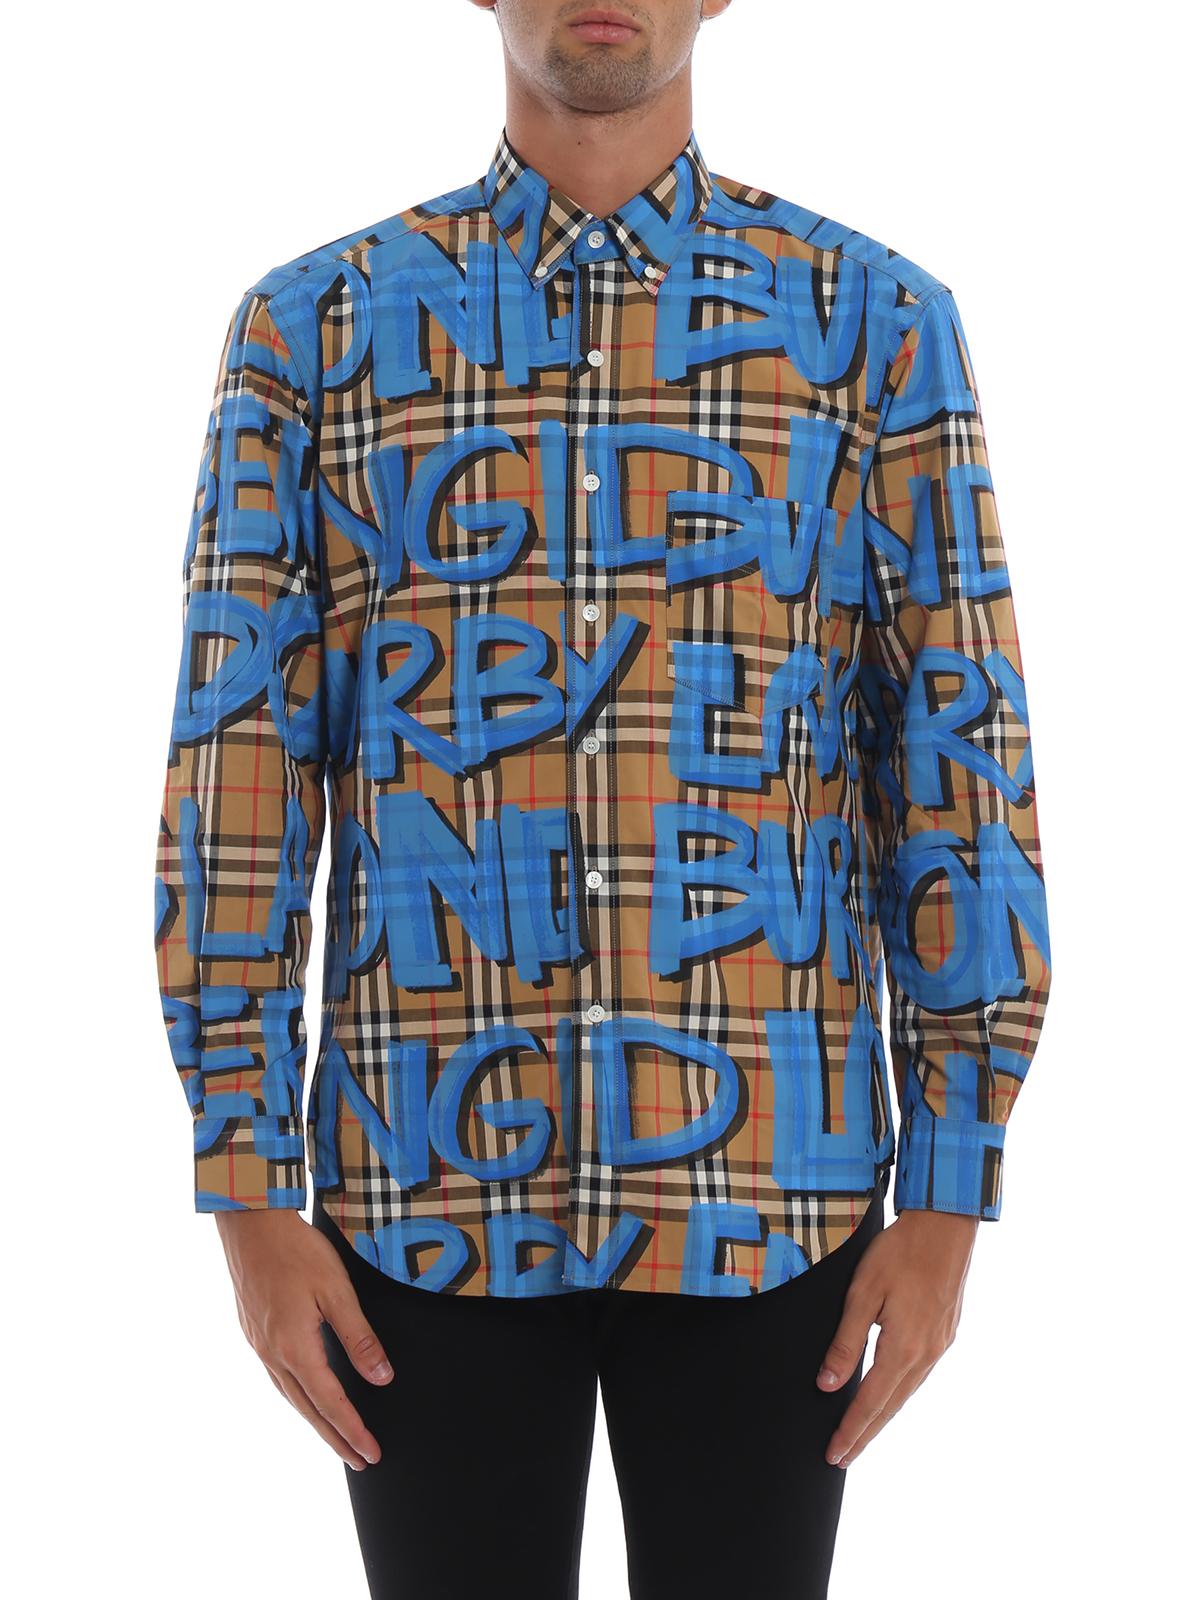 Burberry Shirts Jameson Graffiti Print Check Cotton Shirt